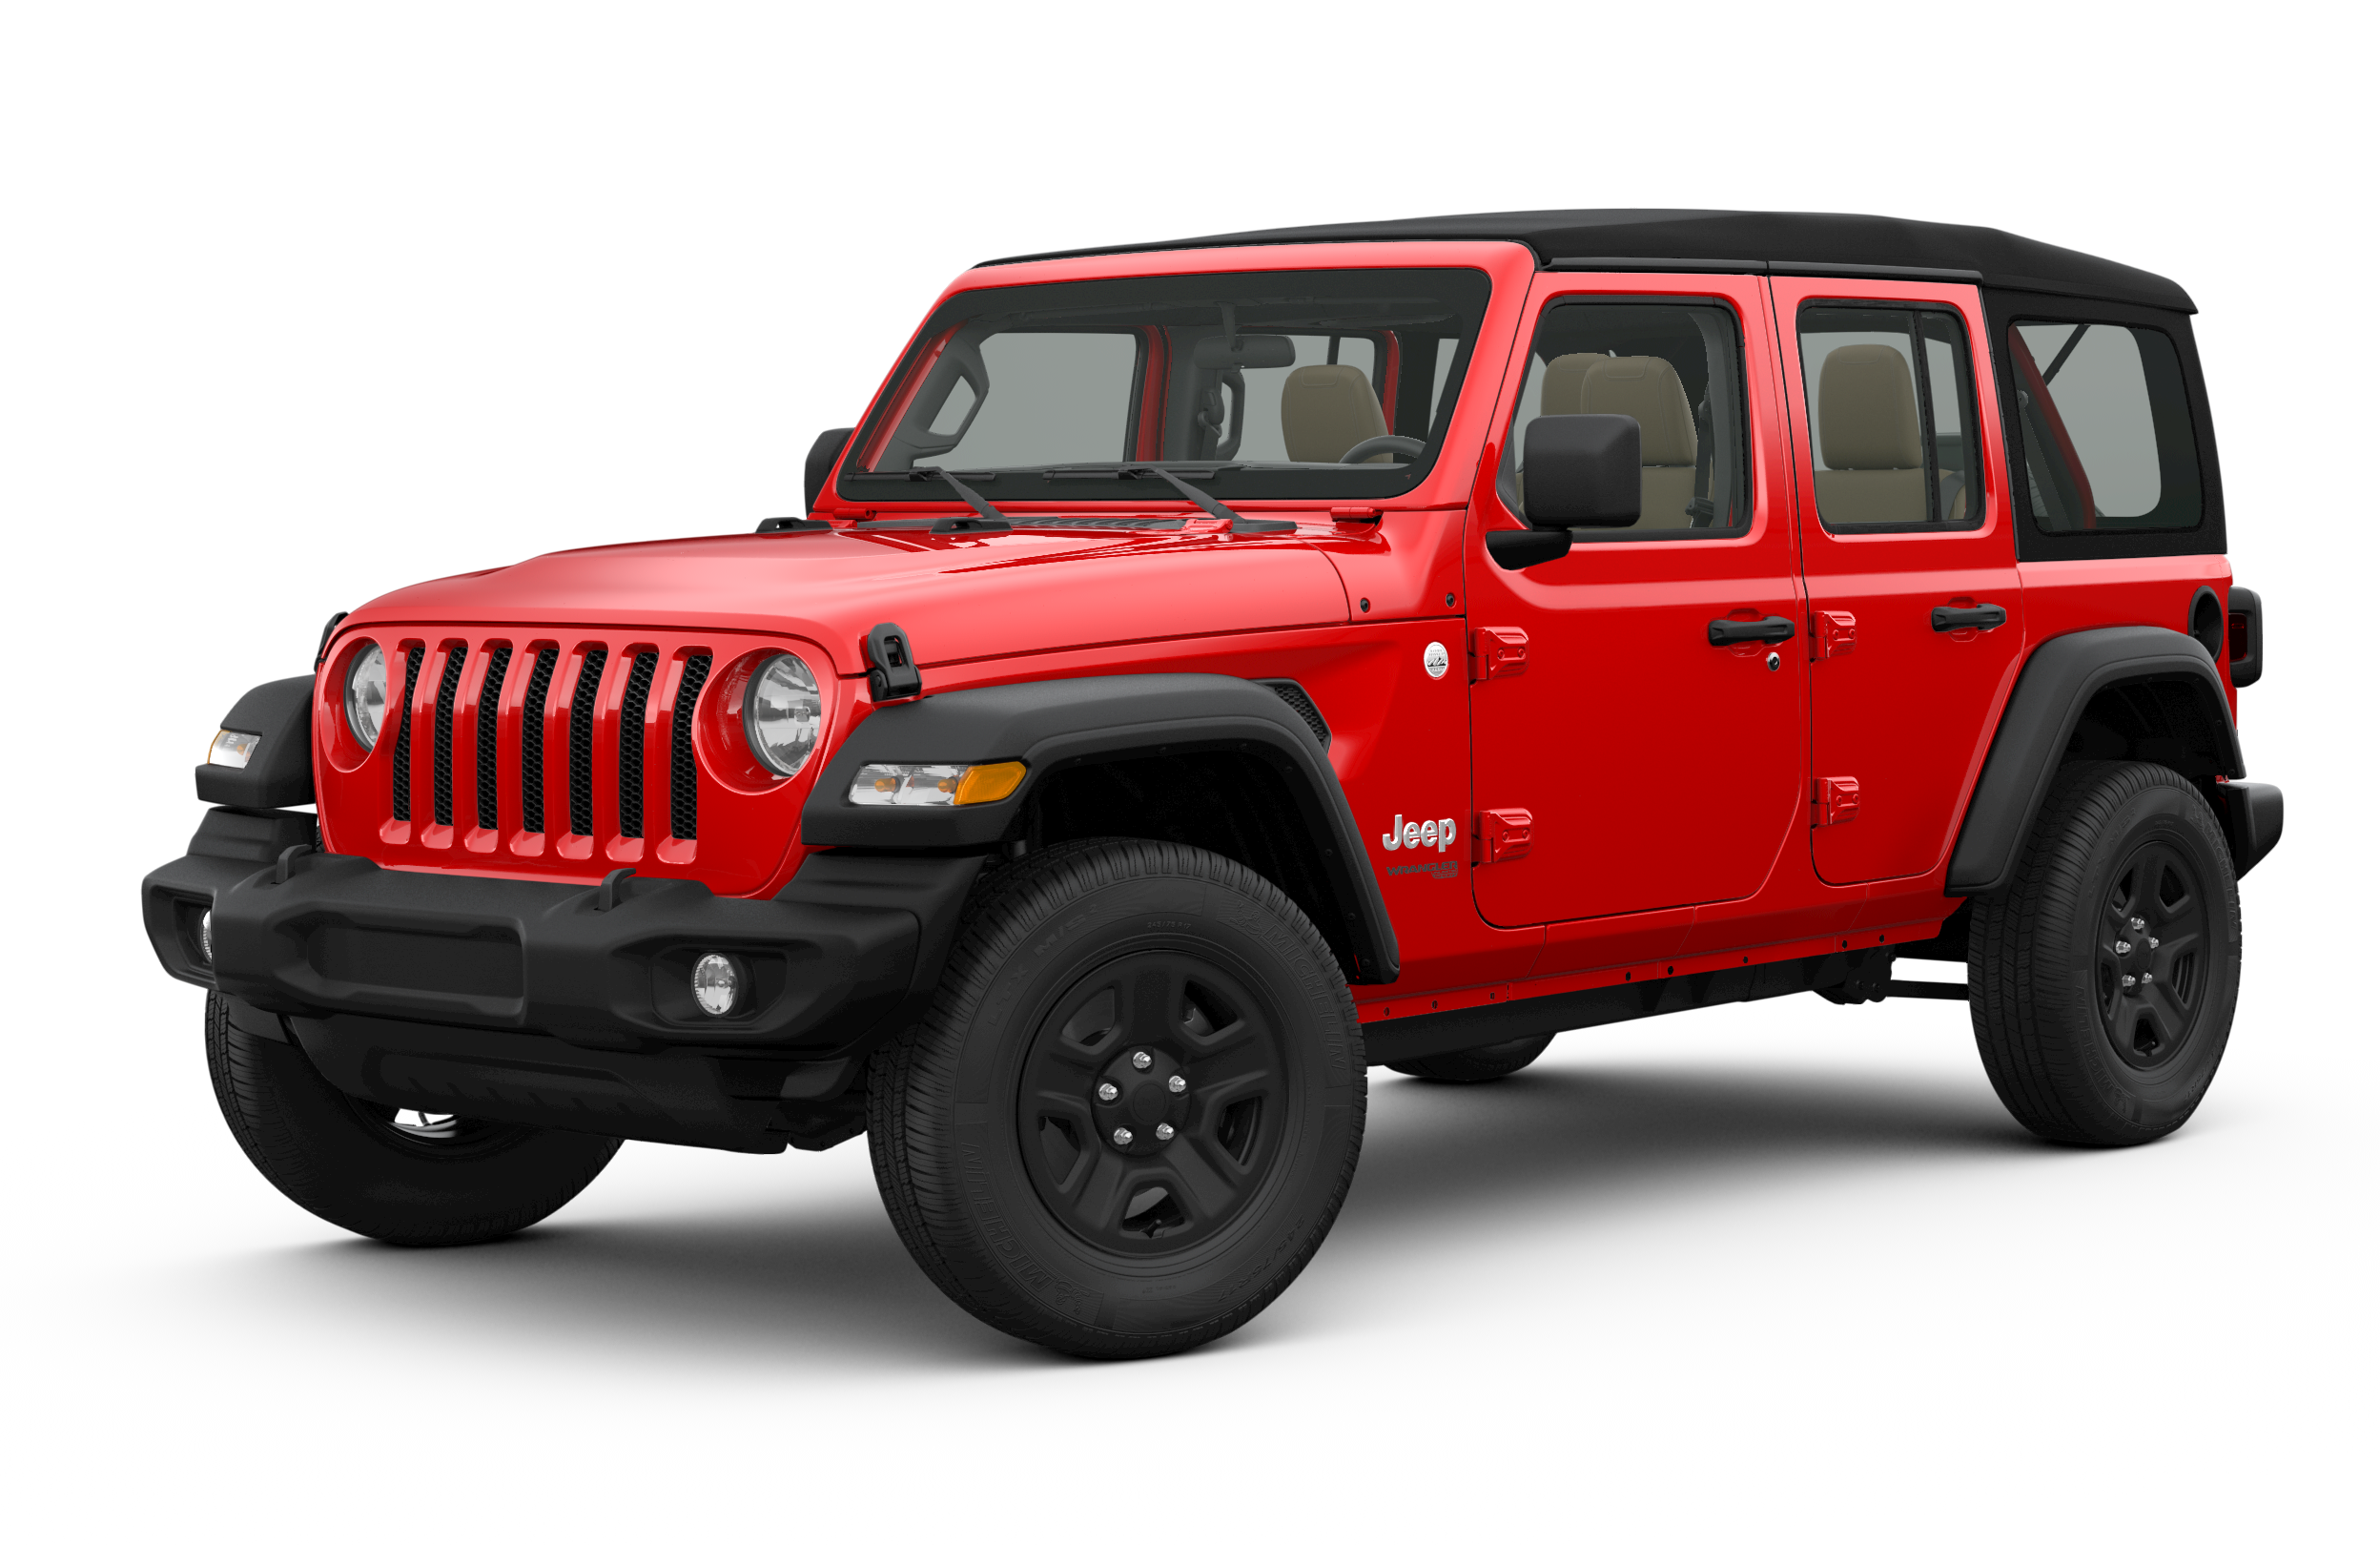 Tom O Brien Jeep >> Tom O'Brien Chrysler Jeep Dodge Ram - Greenwood | New Chrysler, Dodge, Jeep, Ram dealership in ...